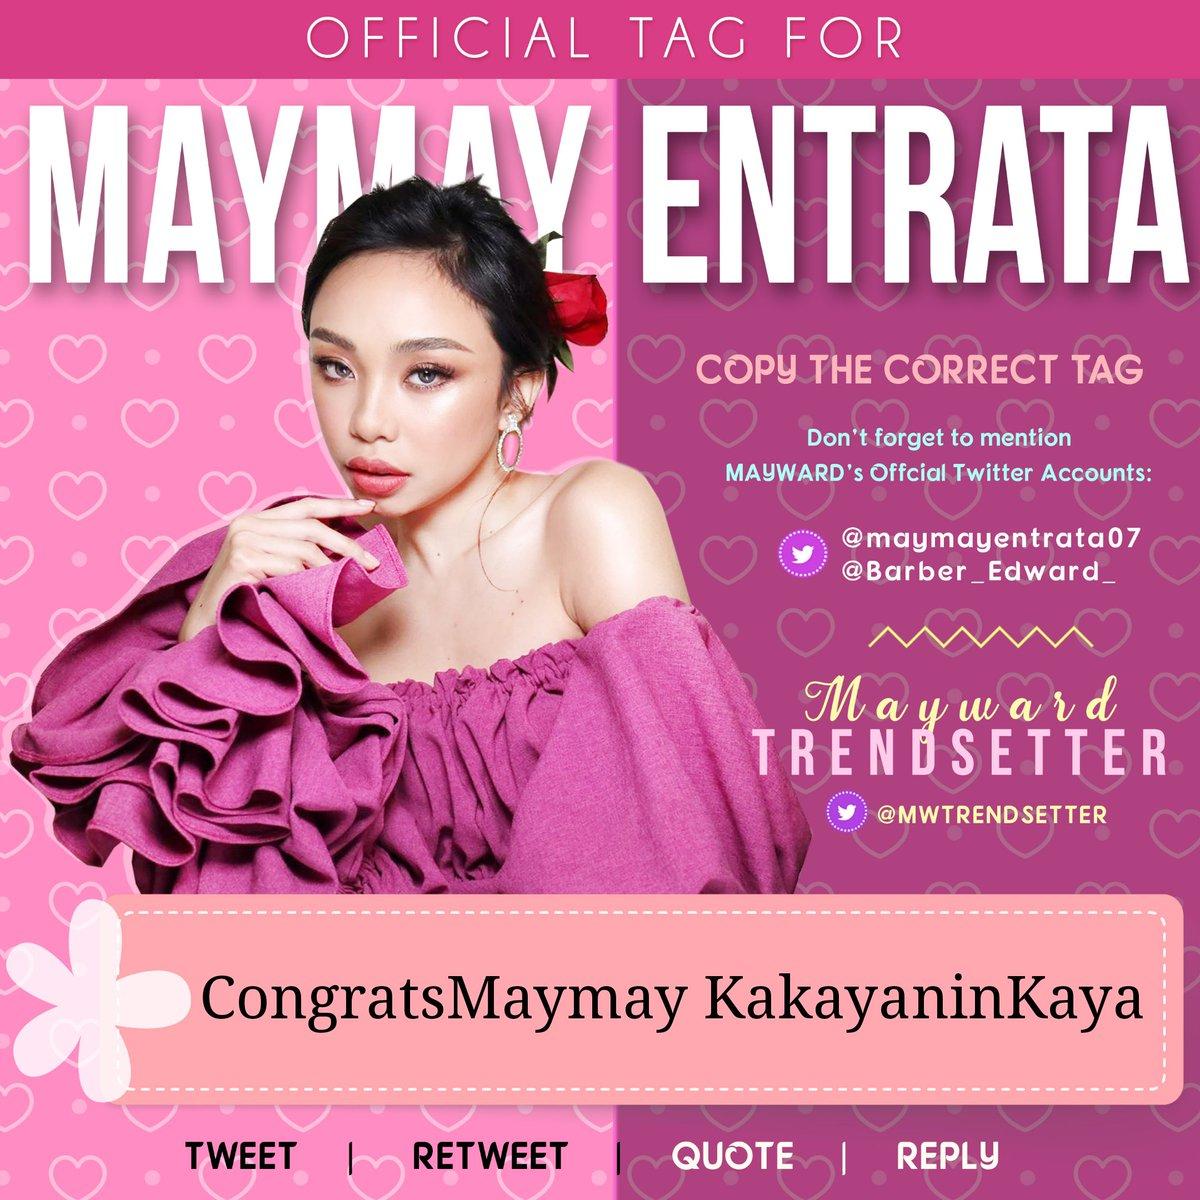 Celebrating the milestones of Kakayanin Kaya by Maymay Entrata - now with 3 Million Spotify Streams and 9 Million YouTube views! Congrats, Maymay!   @StarMusicPH @Starpopph  OFFICIAL TAG FOR MAYMAY:  CongratsMaymay KakayaninKaya  @maymayentrata07 @Barber_Edward_<br>http://pic.twitter.com/GYkxitzTJp